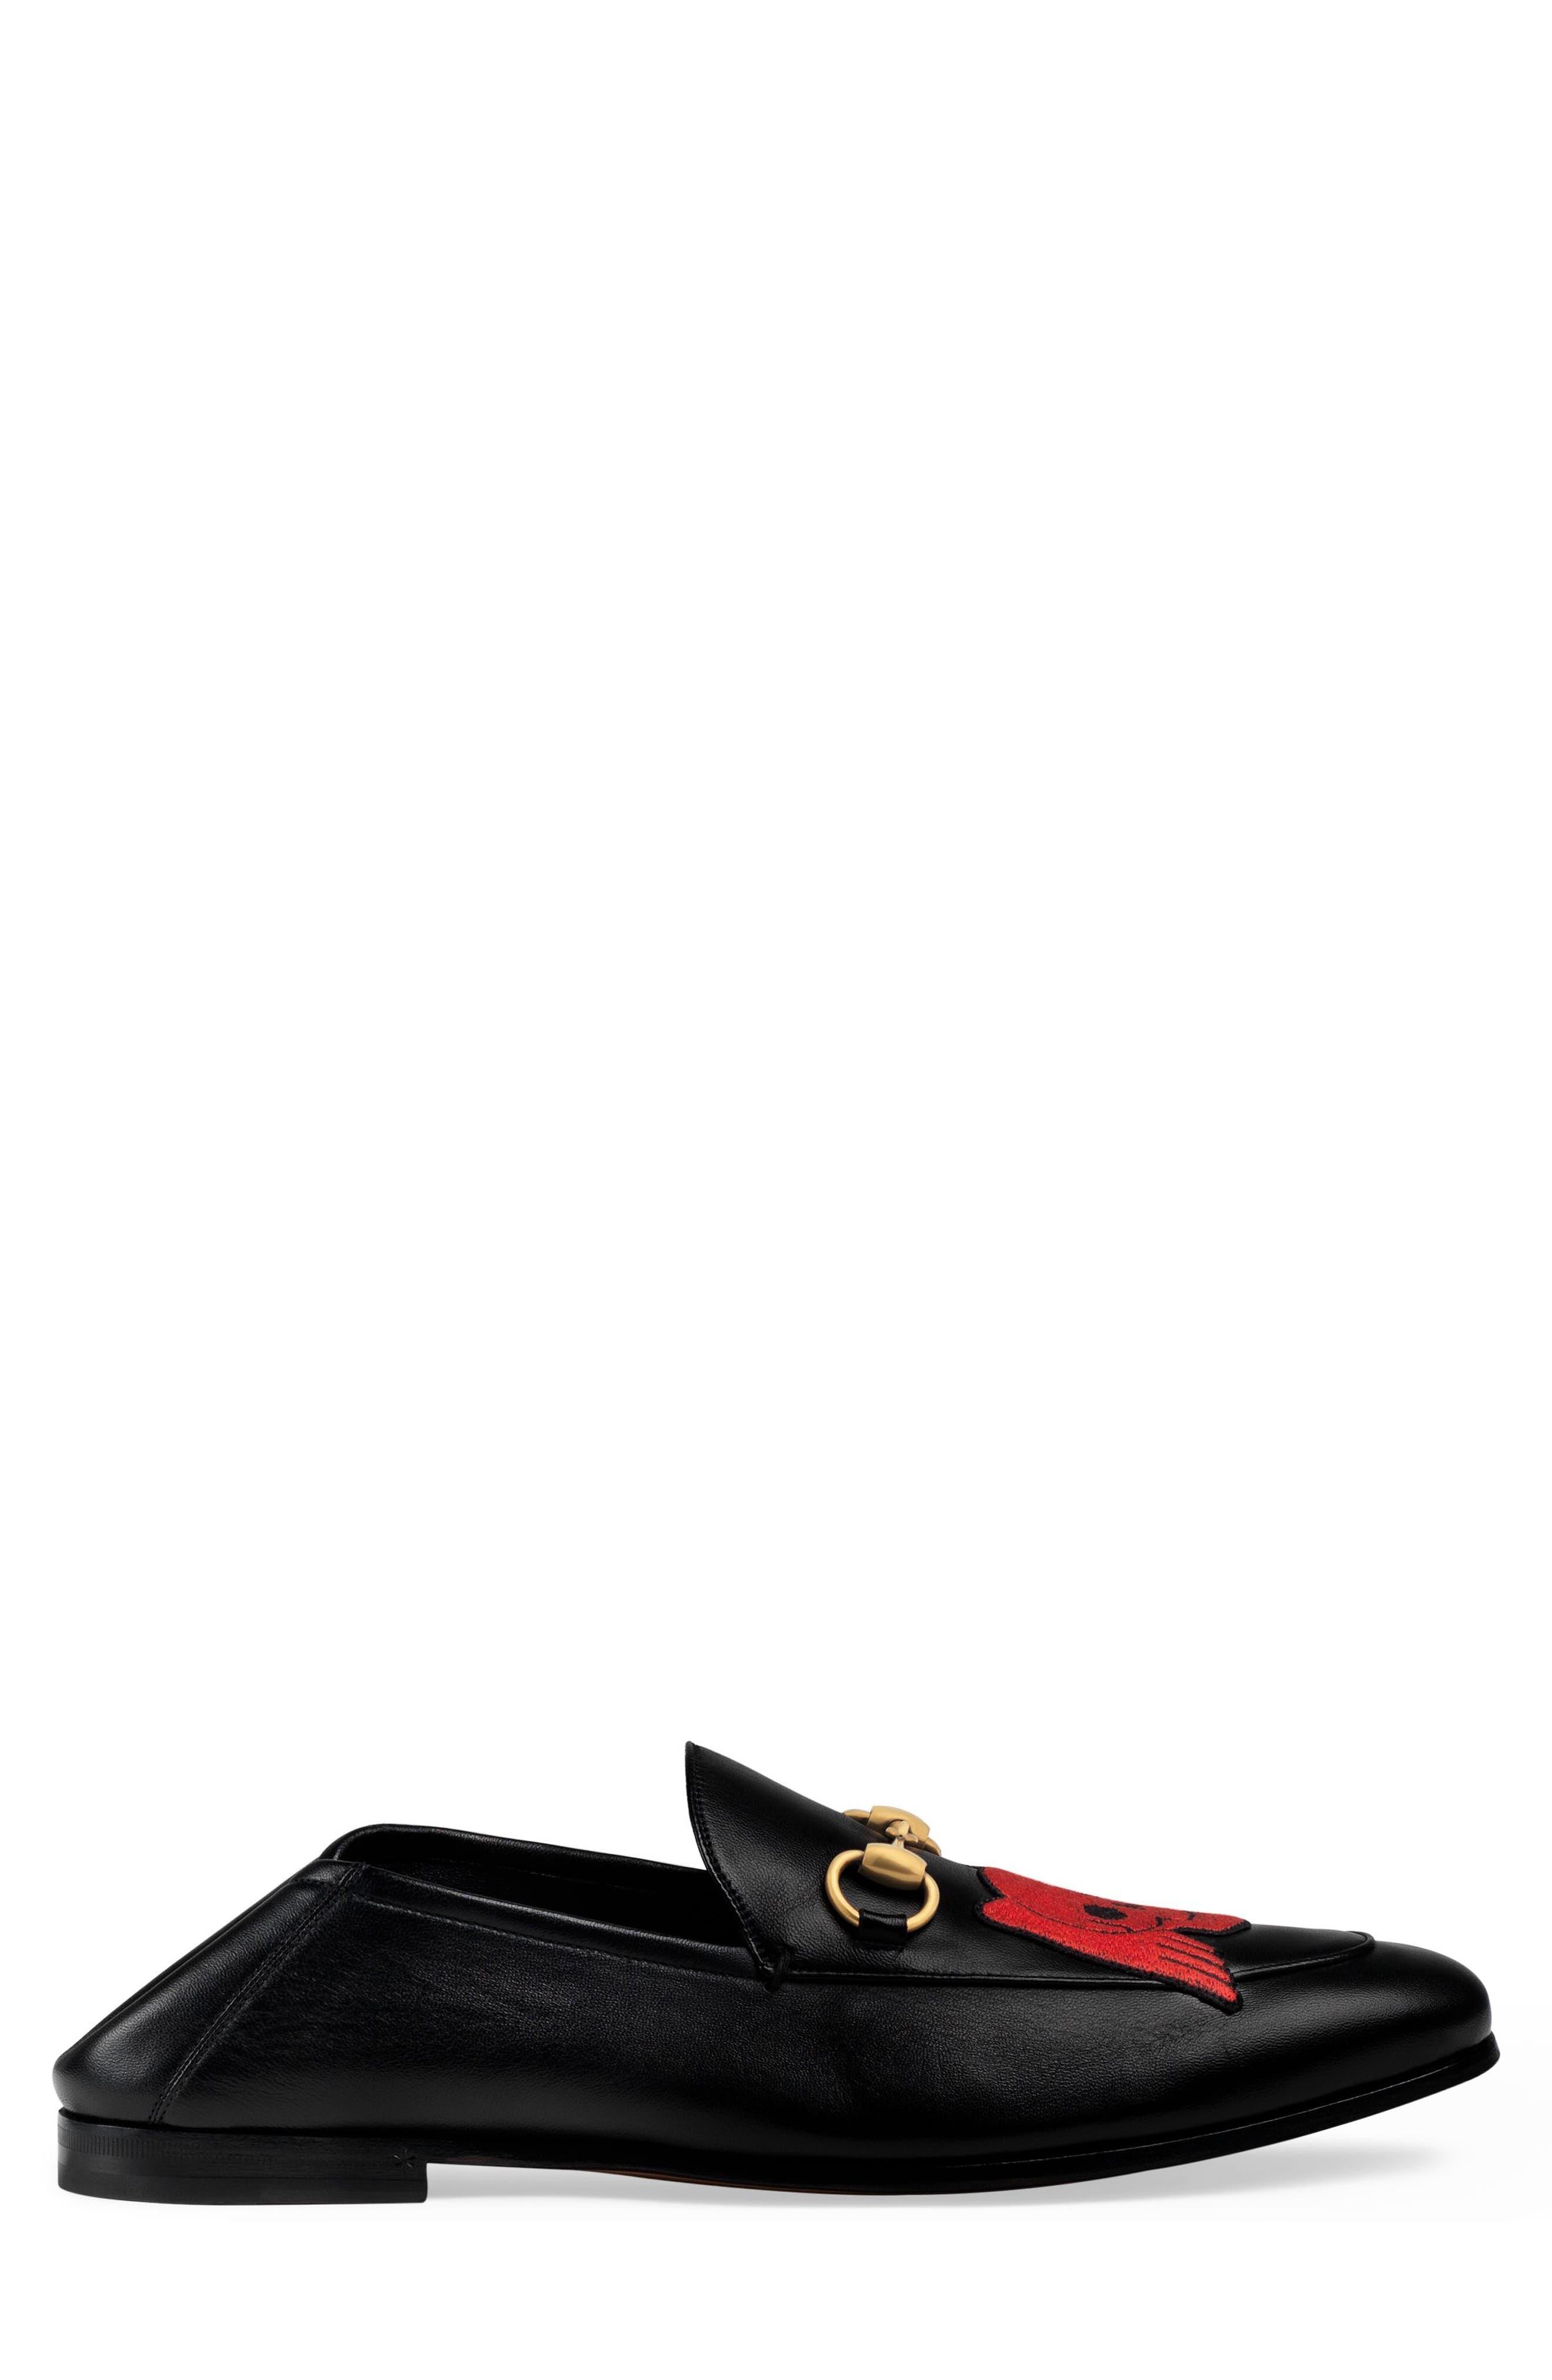 Brixton Embroidered Loafer,                             Alternate thumbnail 3, color,                             BLACK/ BLACK